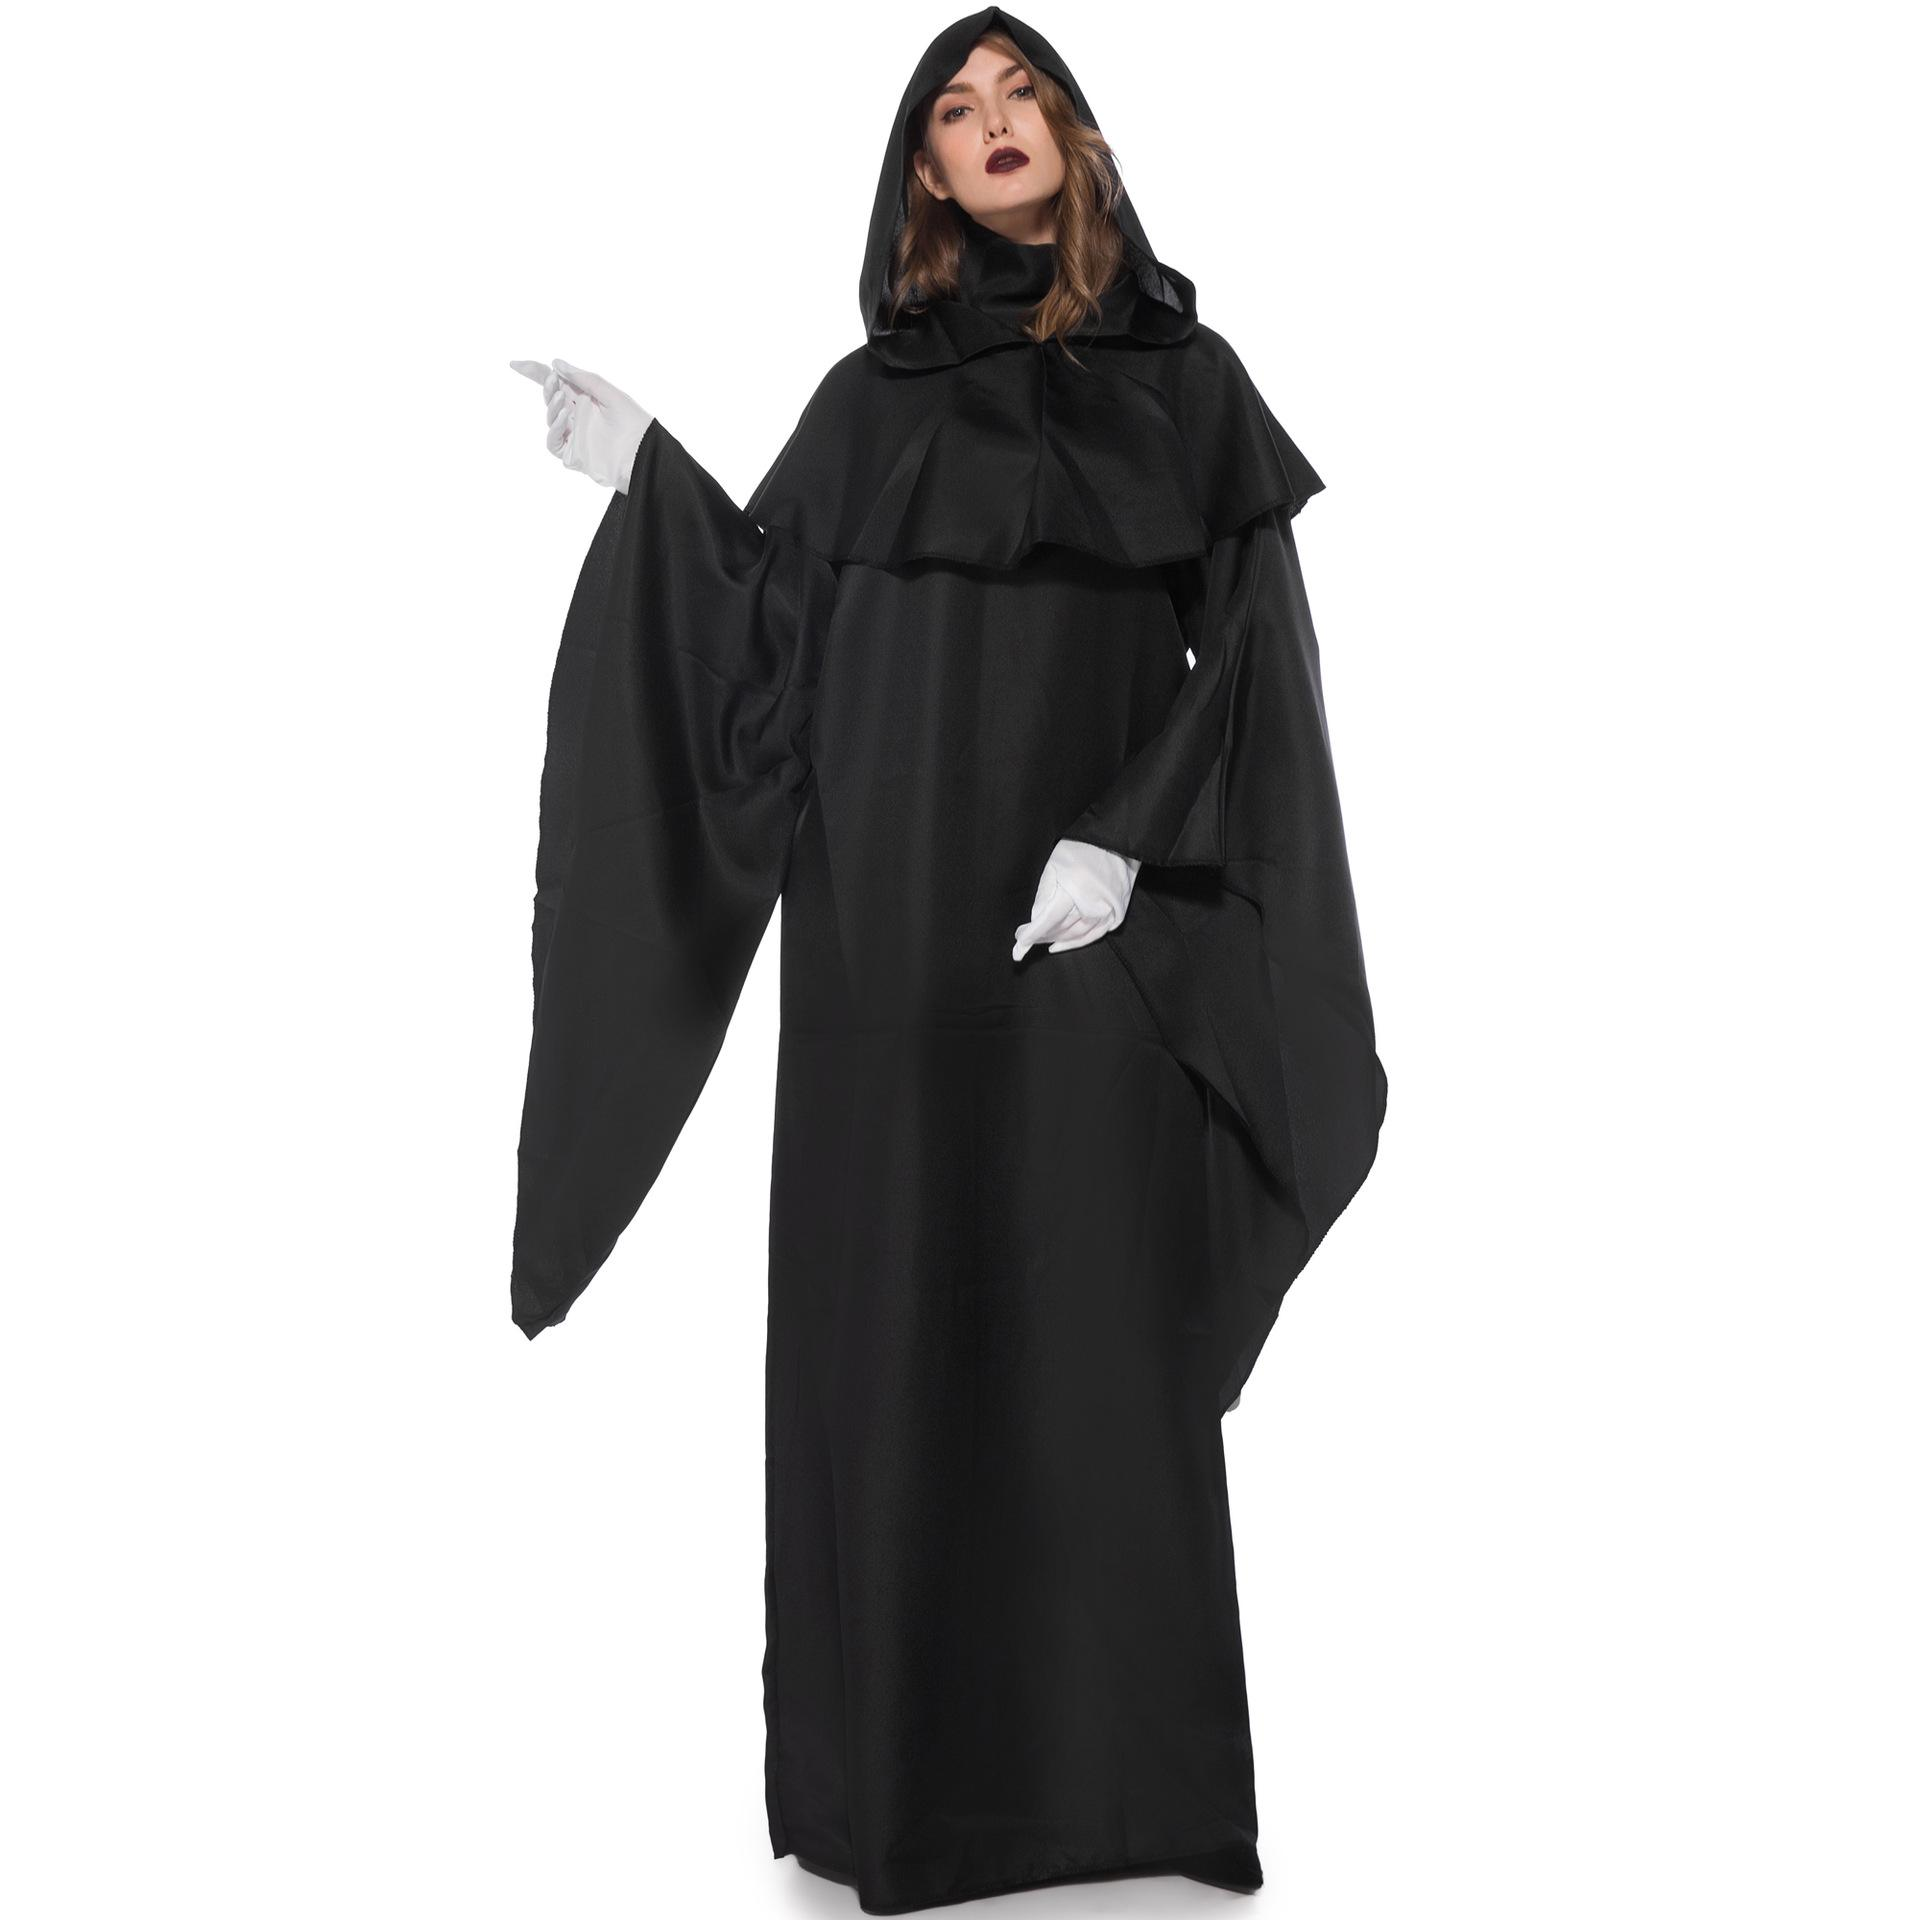 cosplay disfraz halloween costumes for women mujer disfraces